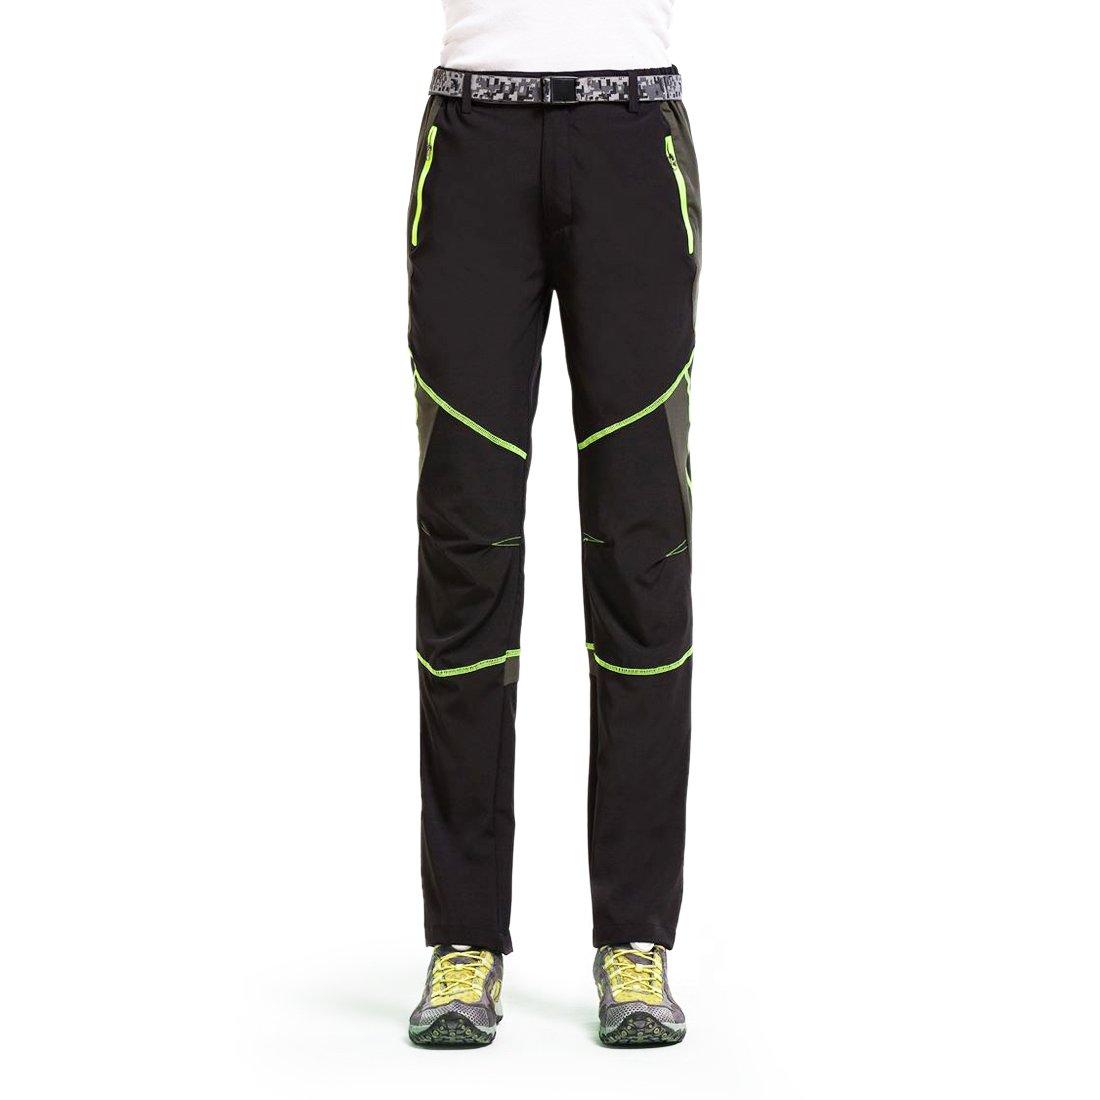 Freiesoldaten Uomo Abbigliamento Sportivo Leggero e Traspirante Pantaloni da Arrampicata Antivento Pantaloni da Trekking da Montagna